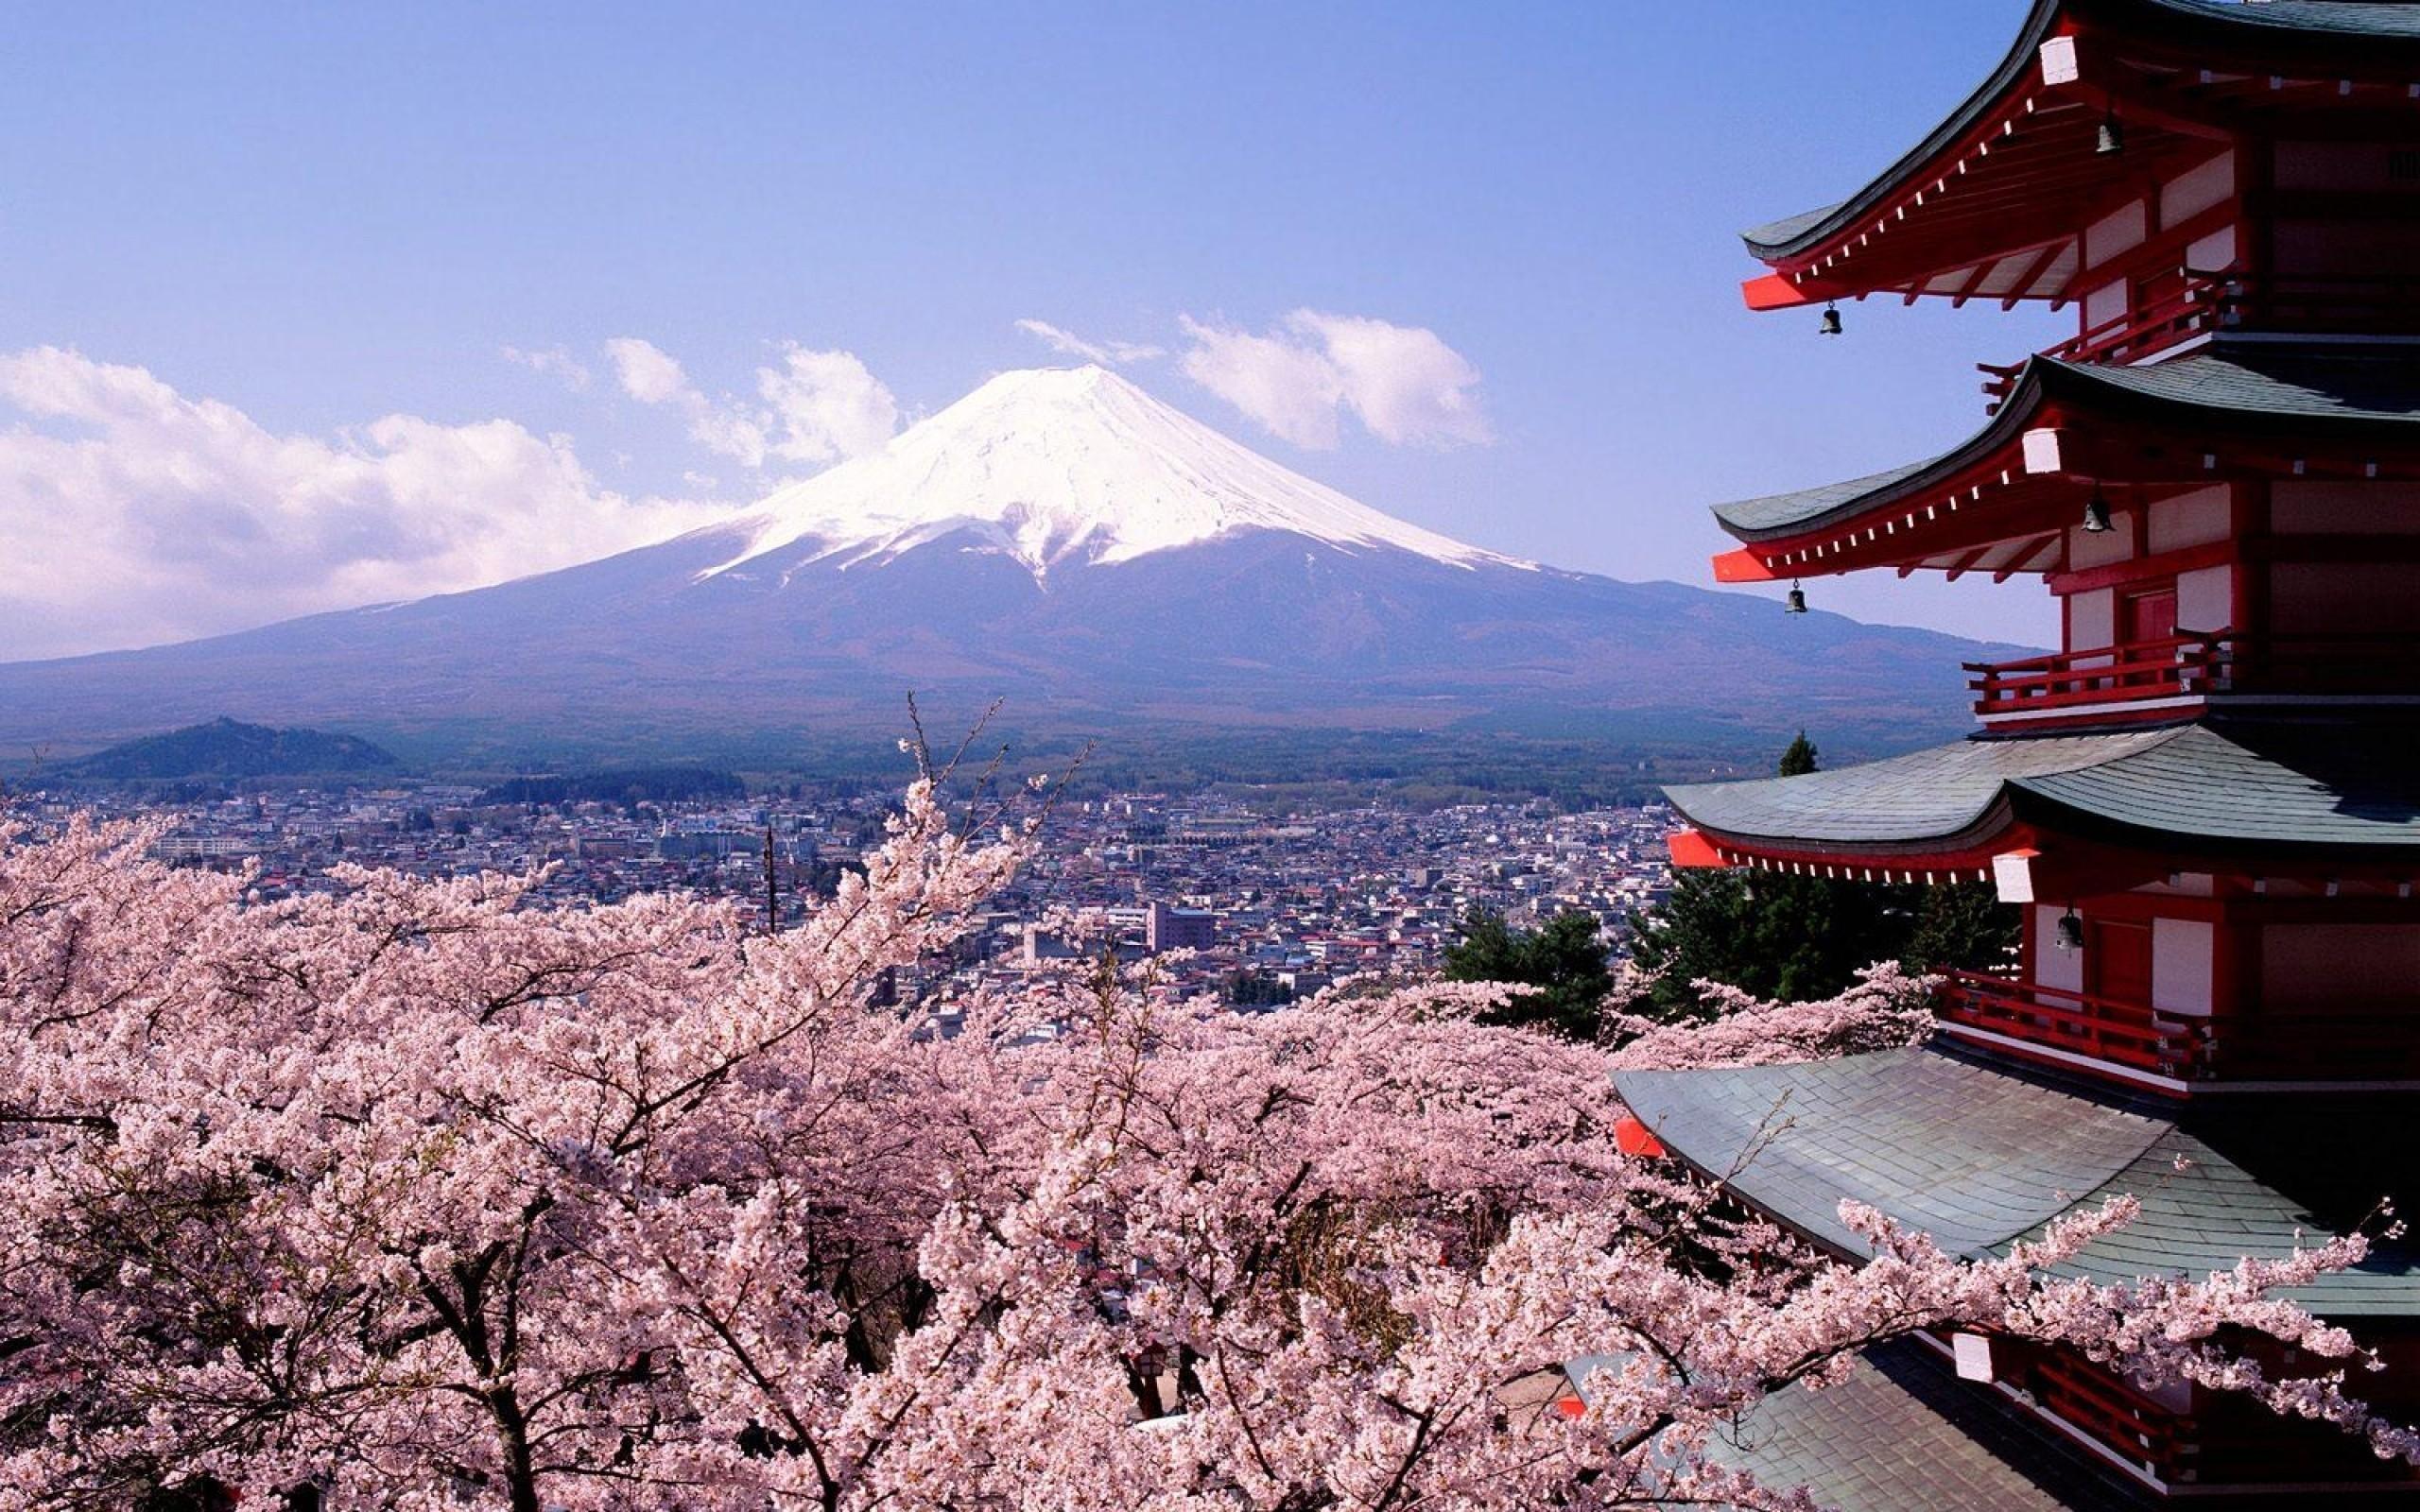 Res: 2560x1600, tokyo-fuji-mountain-and-sakura-flower-hd-wallpaper-desktop